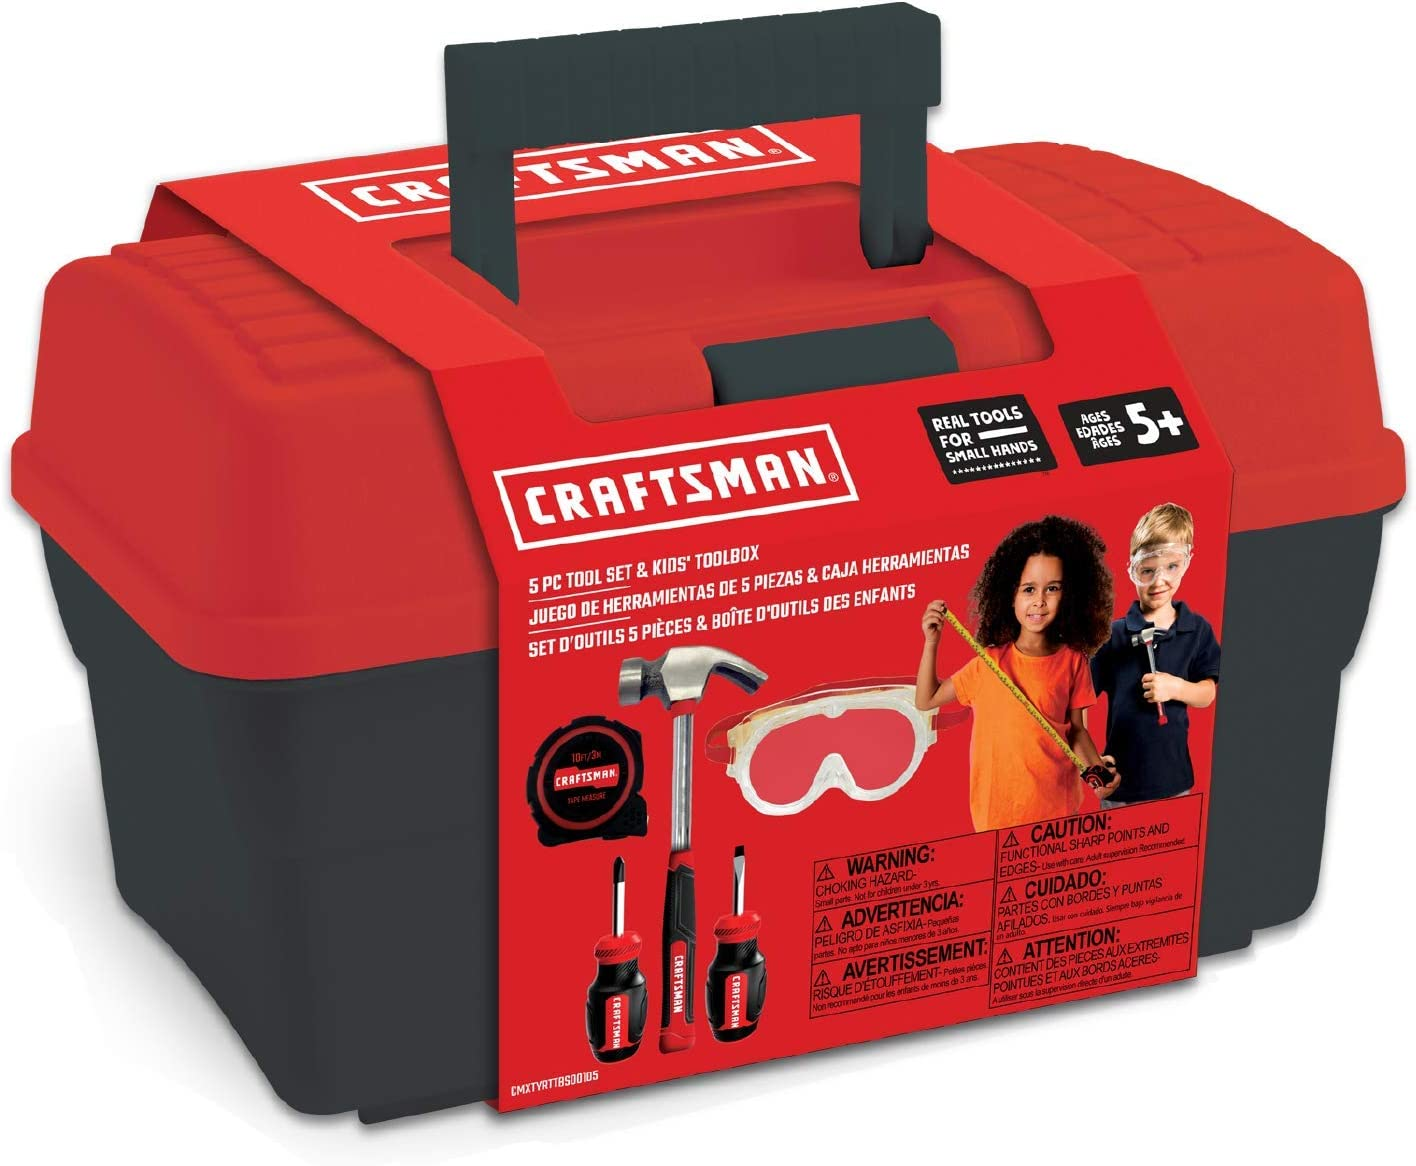 online shop Tool Box+Set 4-5 pcs Seasonal Wrap Introduction Mini Screwdriver PH Flat